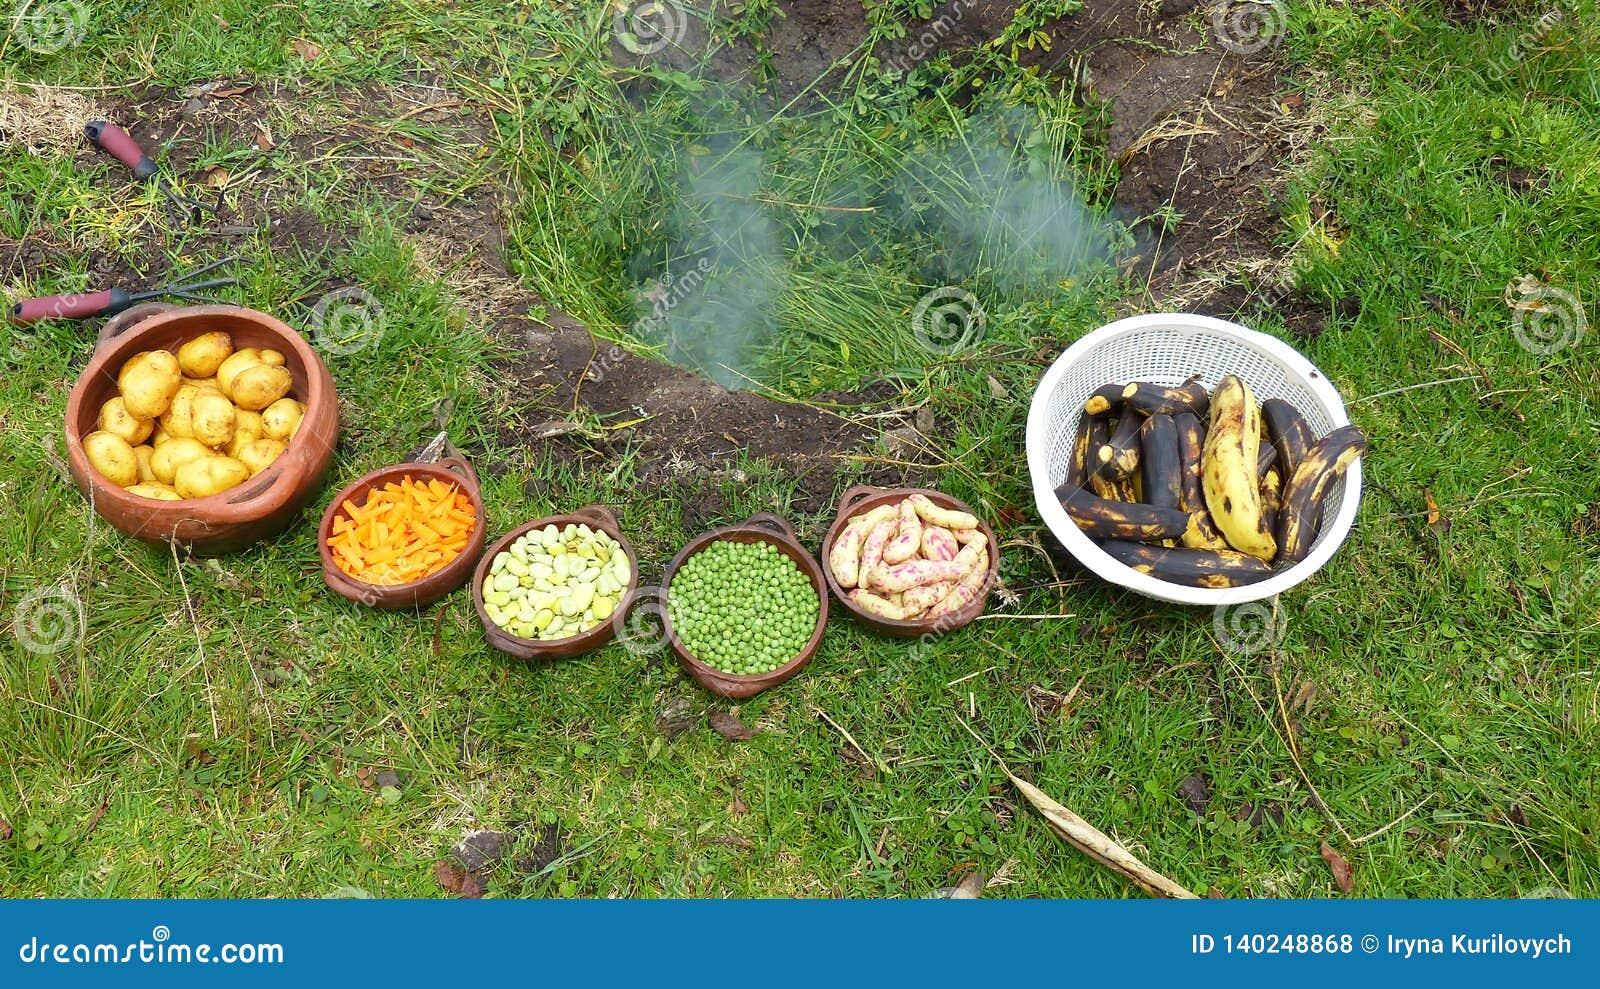 Pachamanca родовой ритуал коренного народа Анд